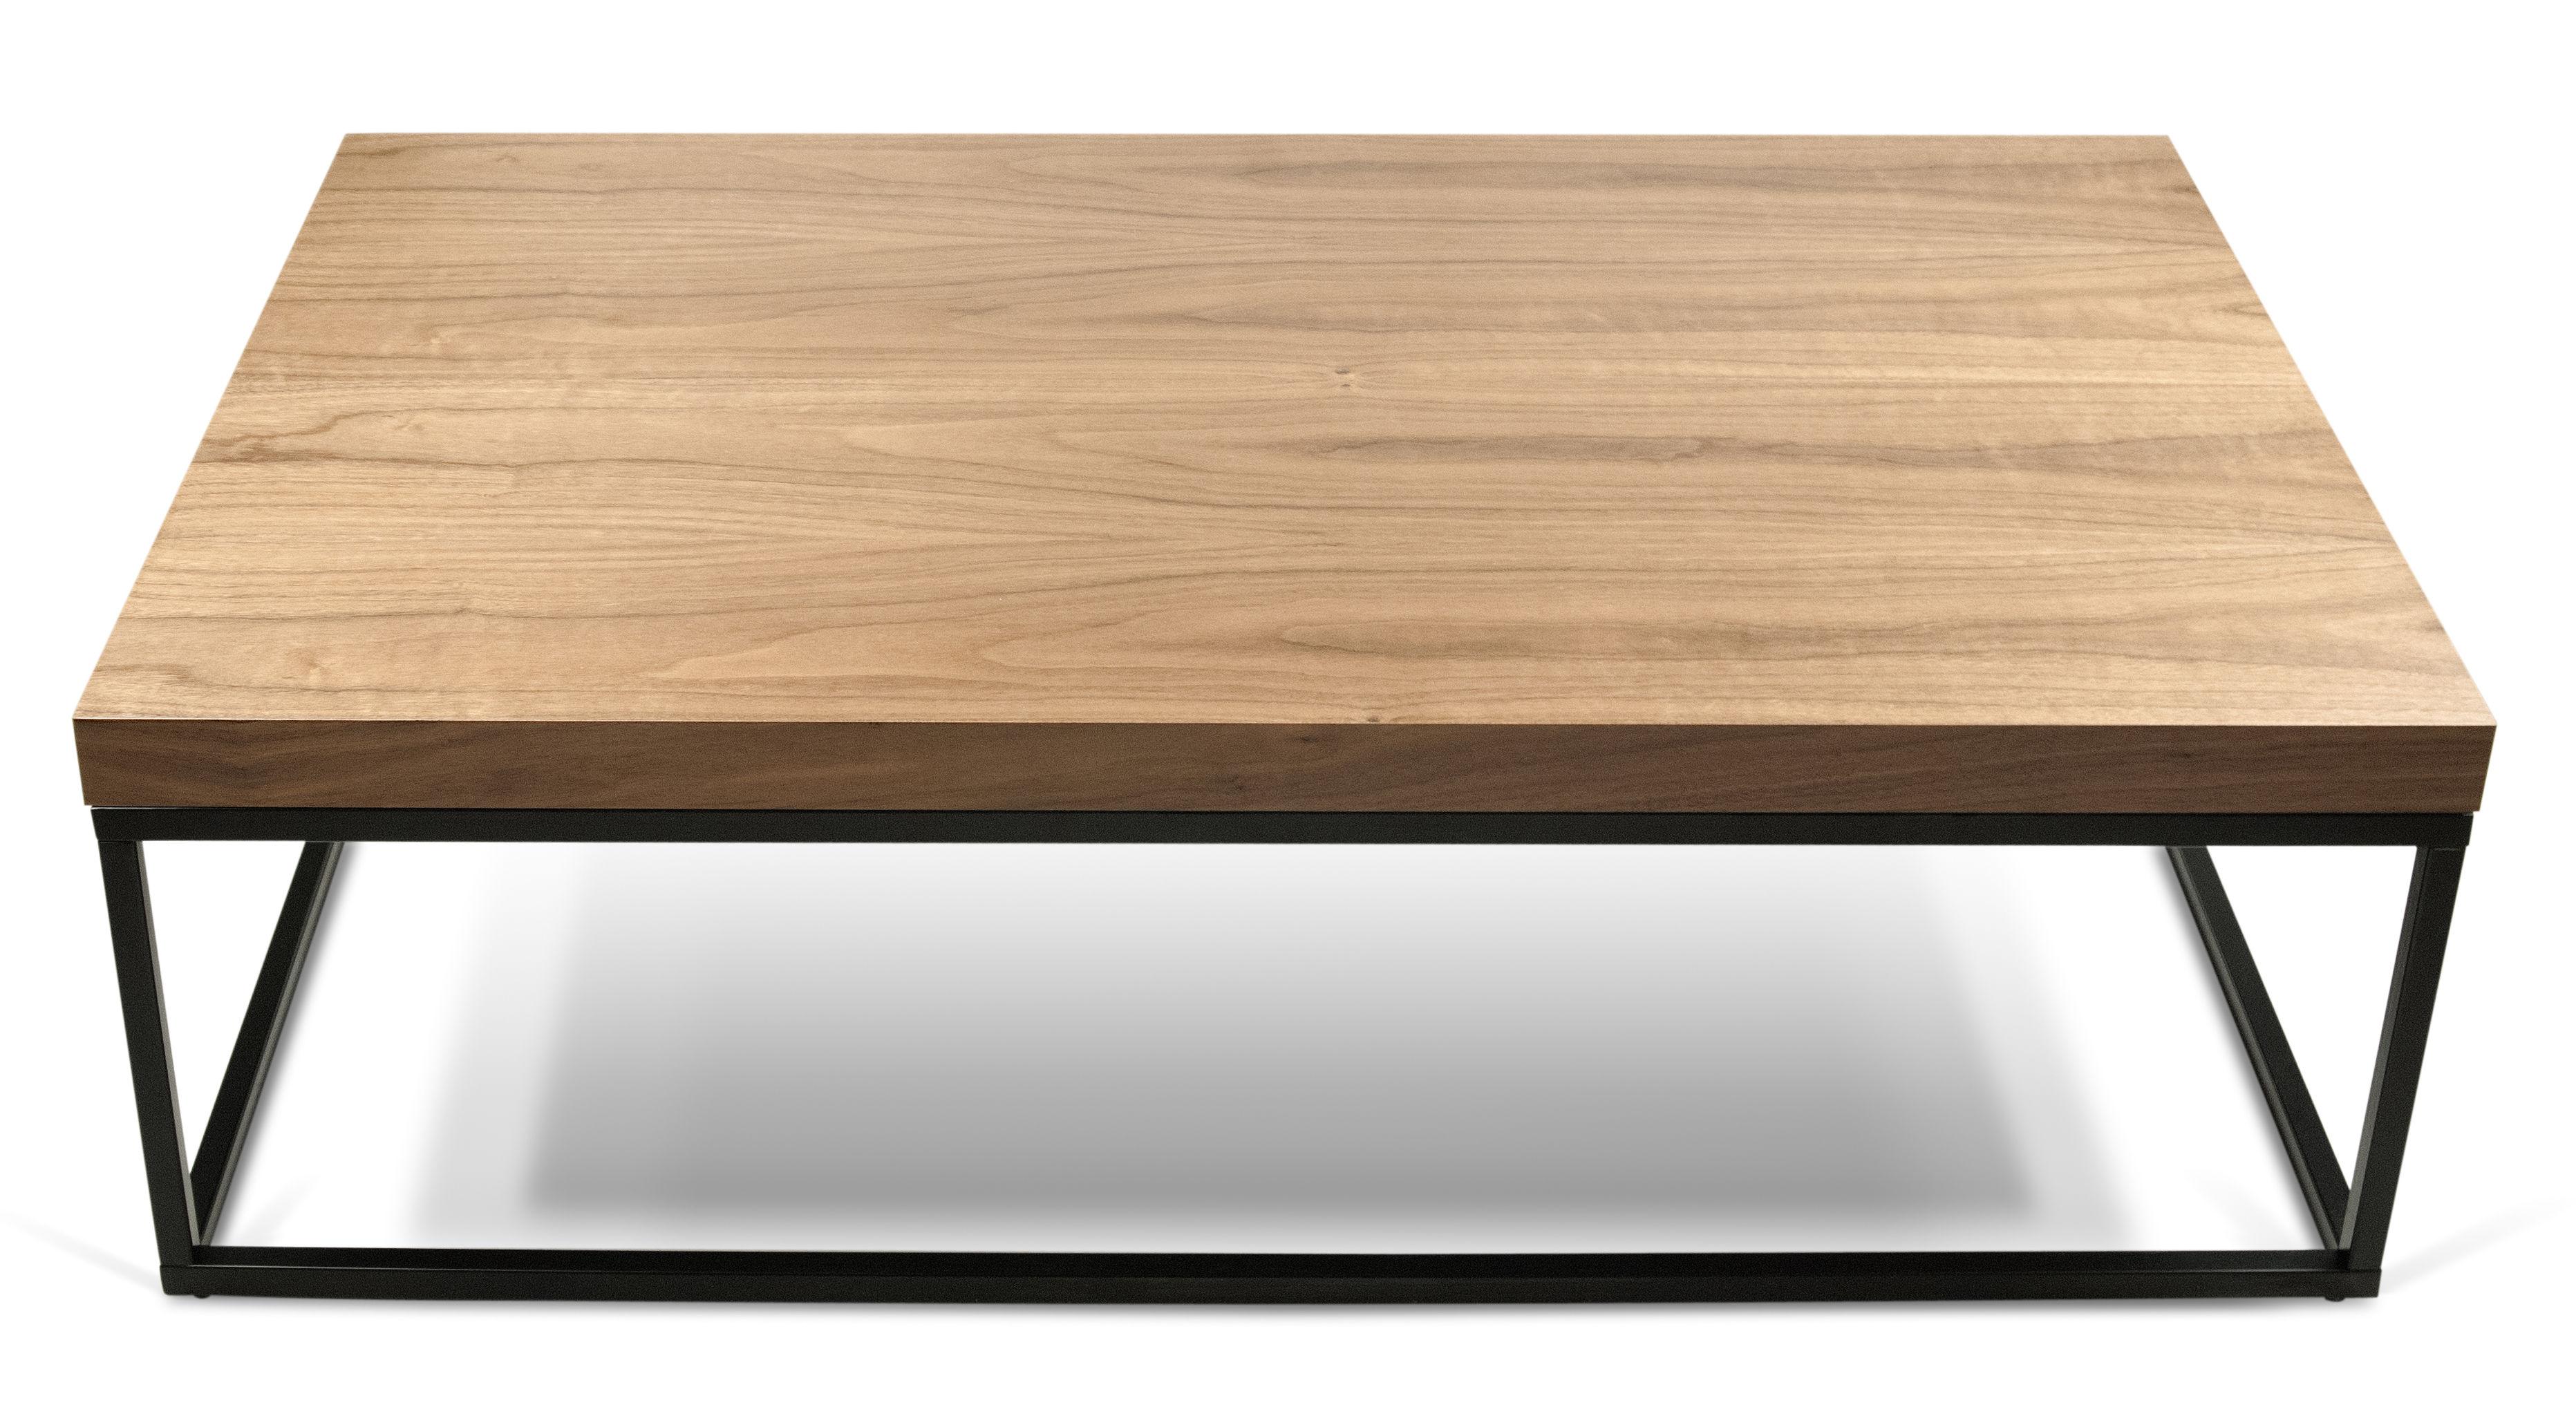 wallnut coffee table walnut walnut black leg by pop up home. Black Bedroom Furniture Sets. Home Design Ideas